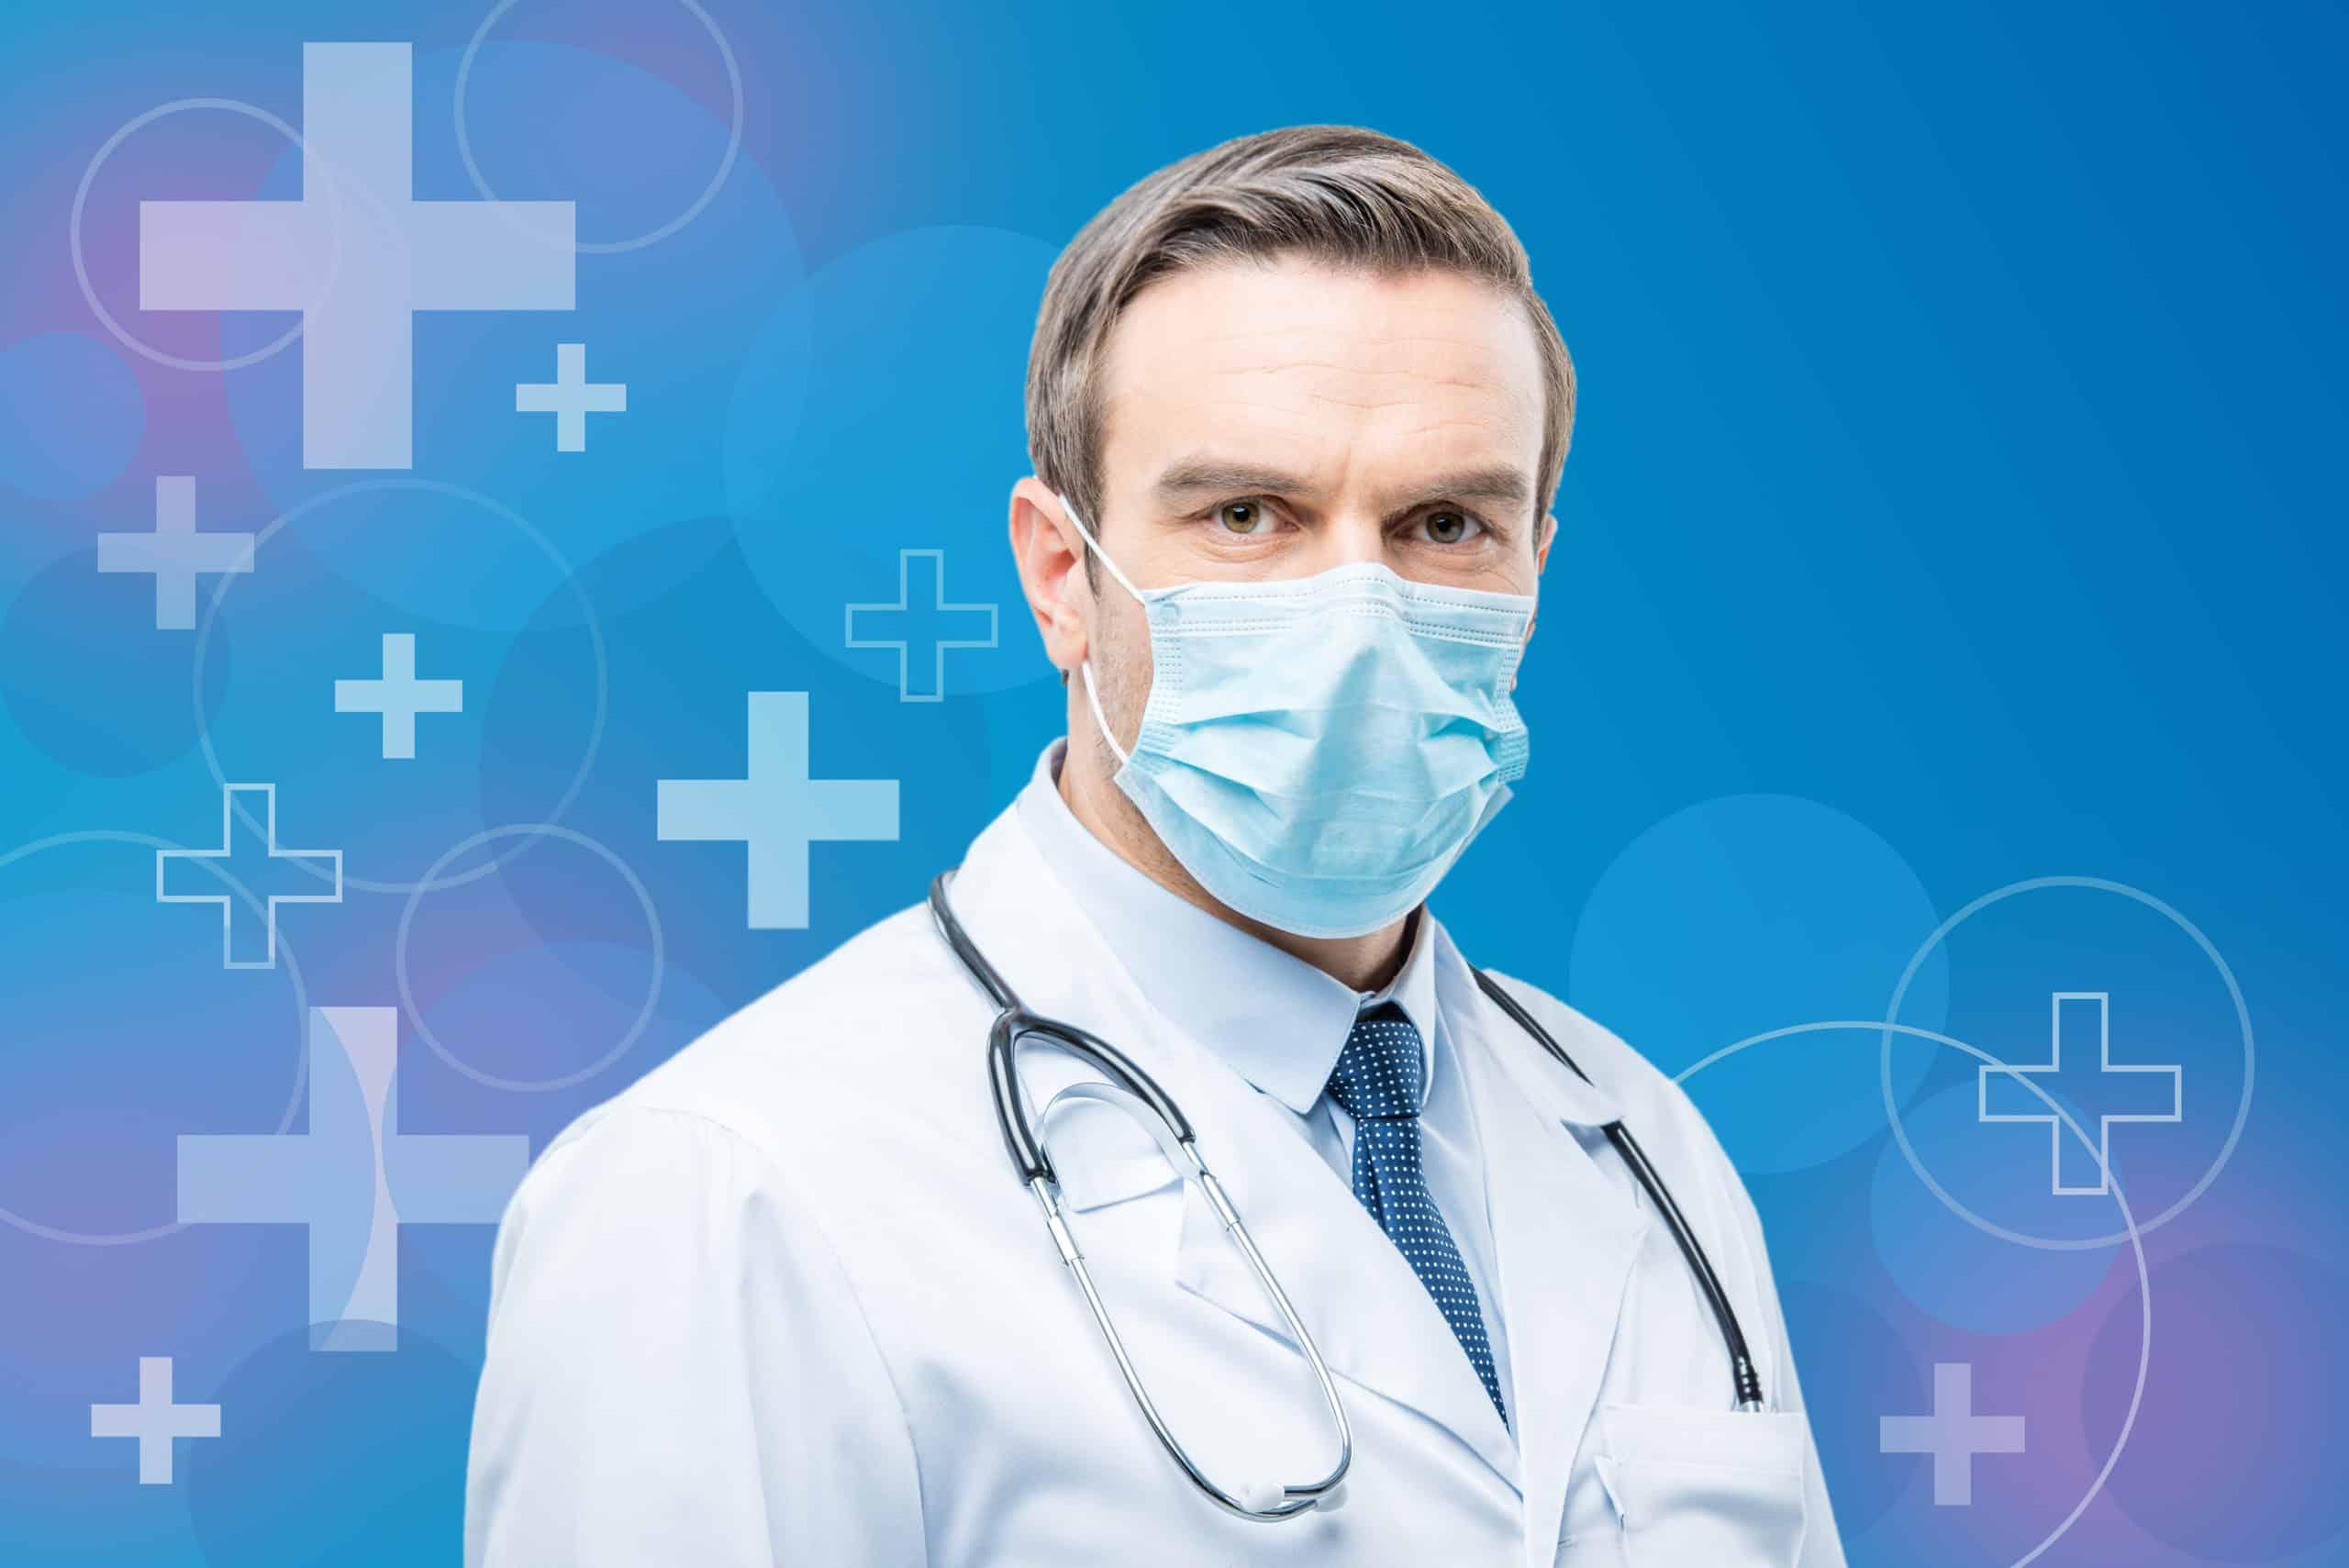 Can Telemedicine Slow The Coronavirus?